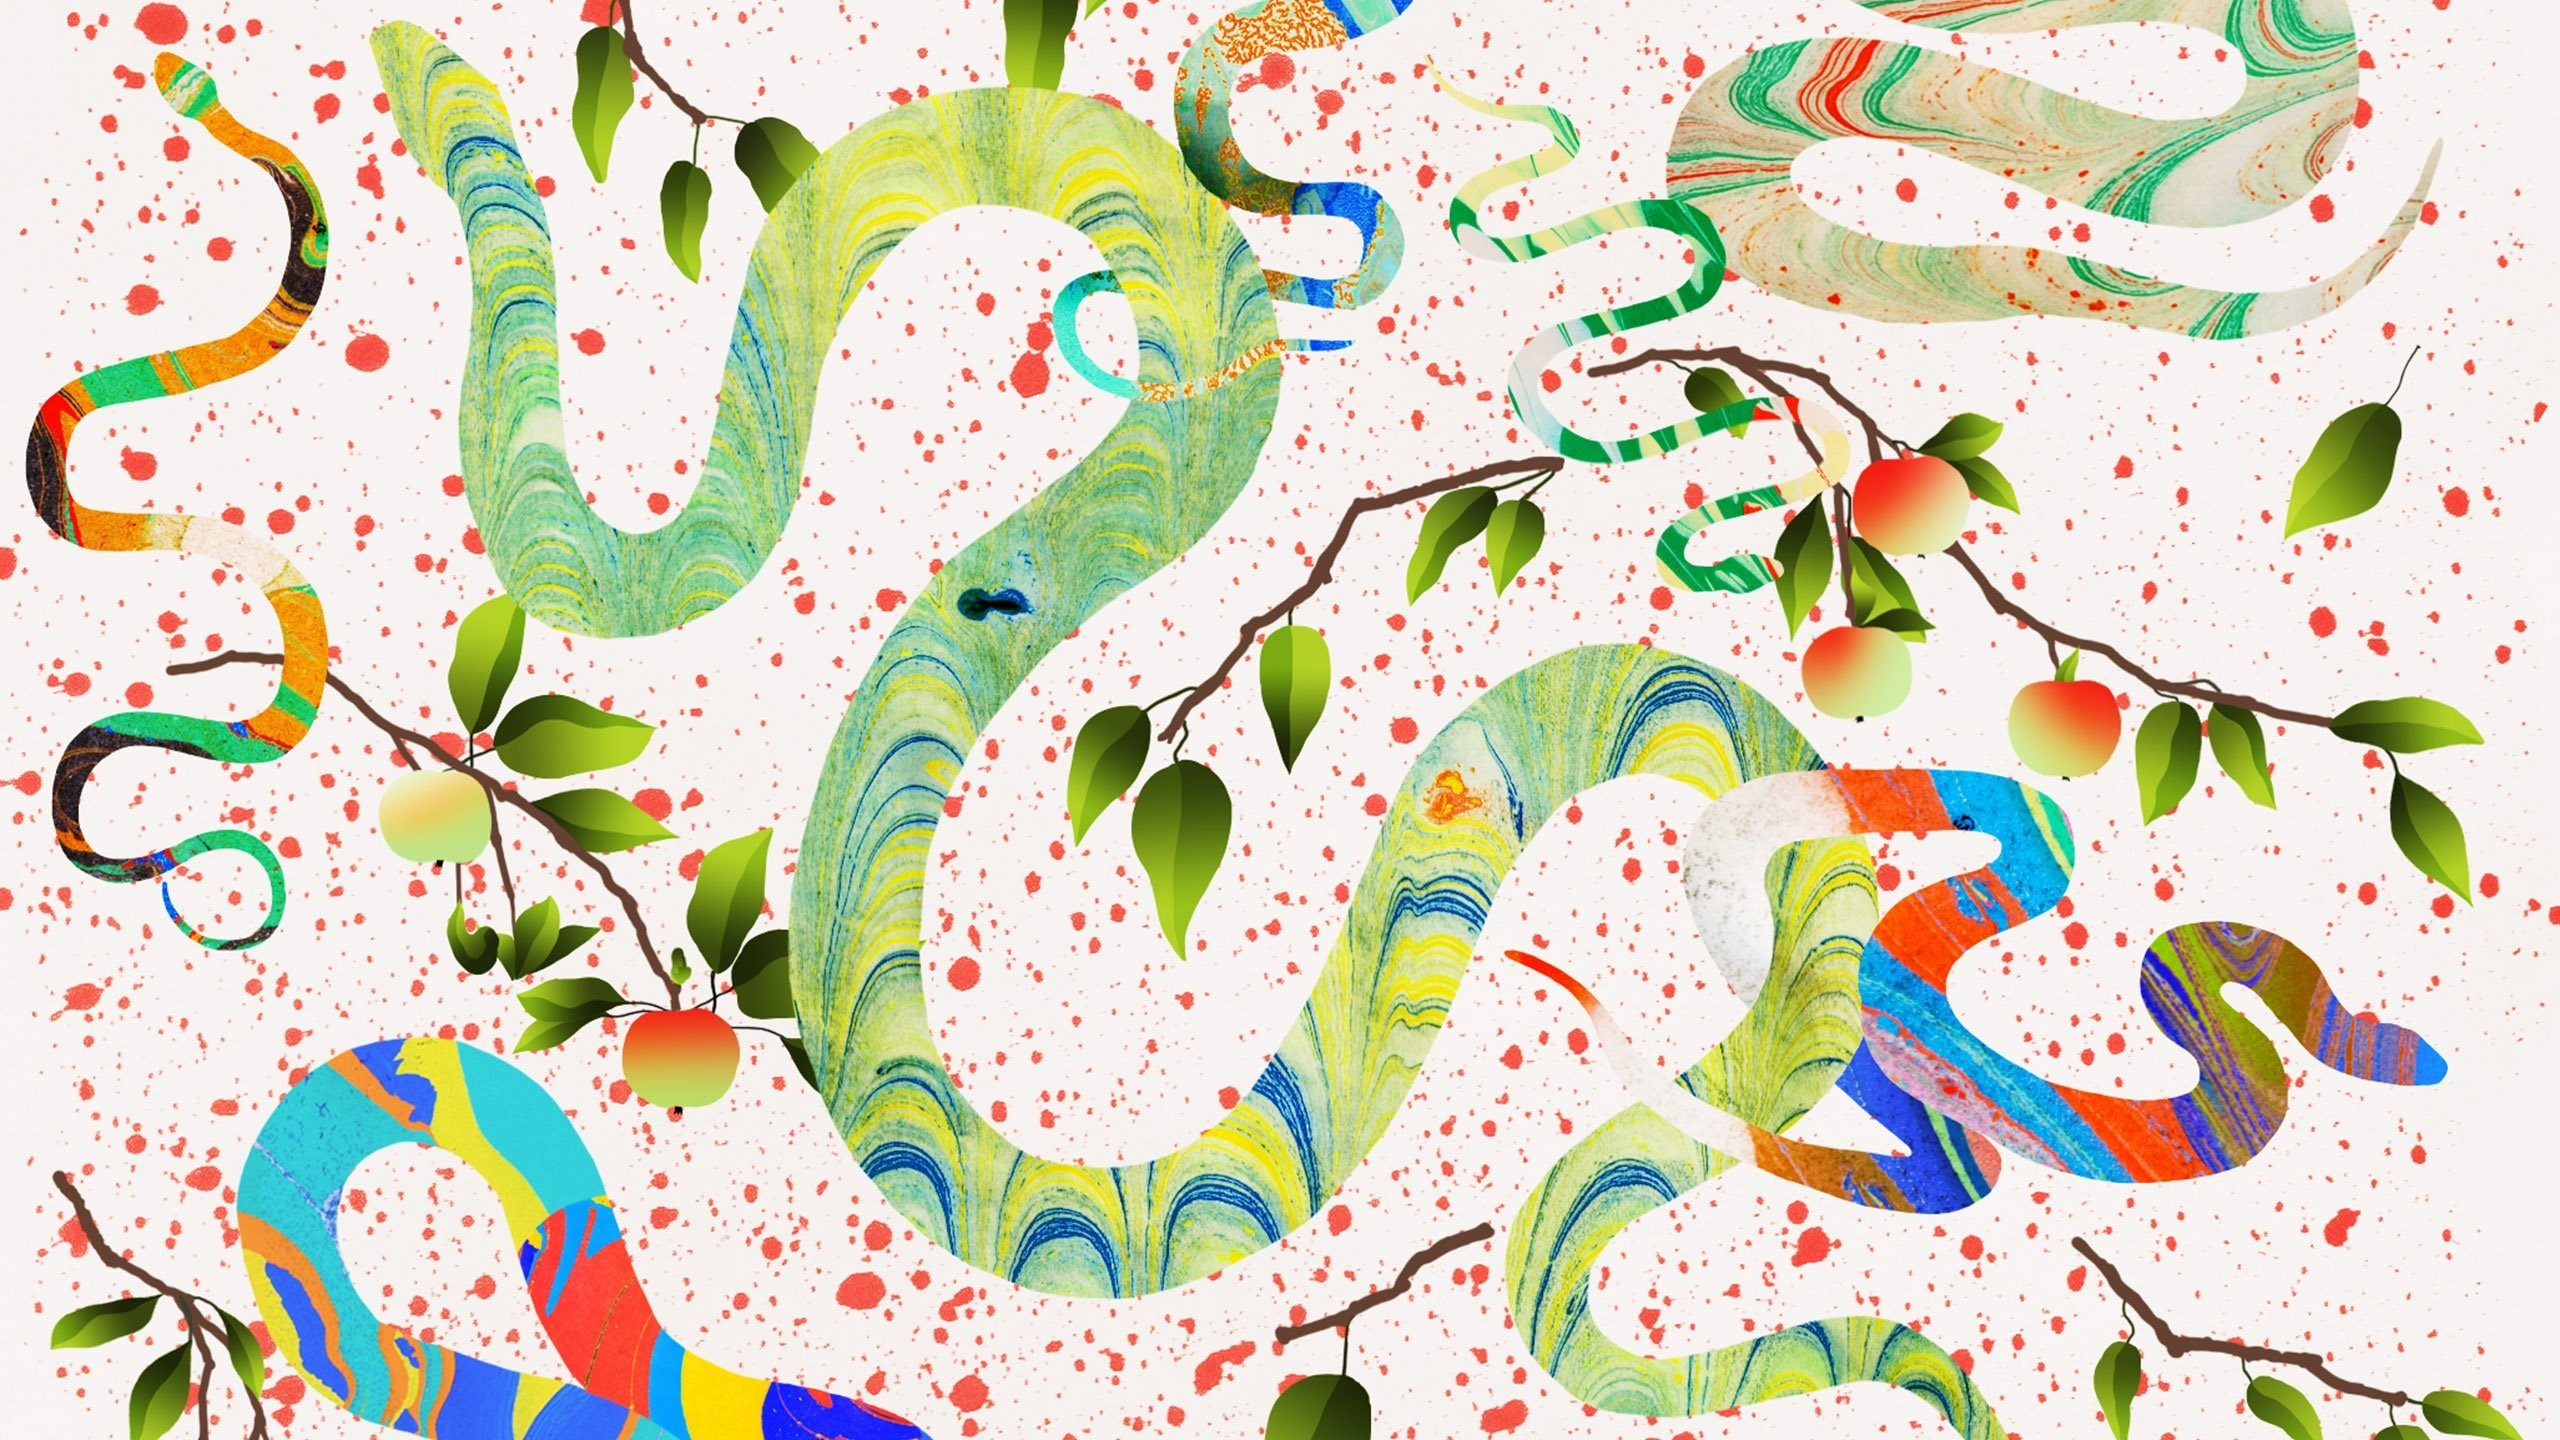 artsy desktop backgrounds  u00b7 u2460 wallpapertag